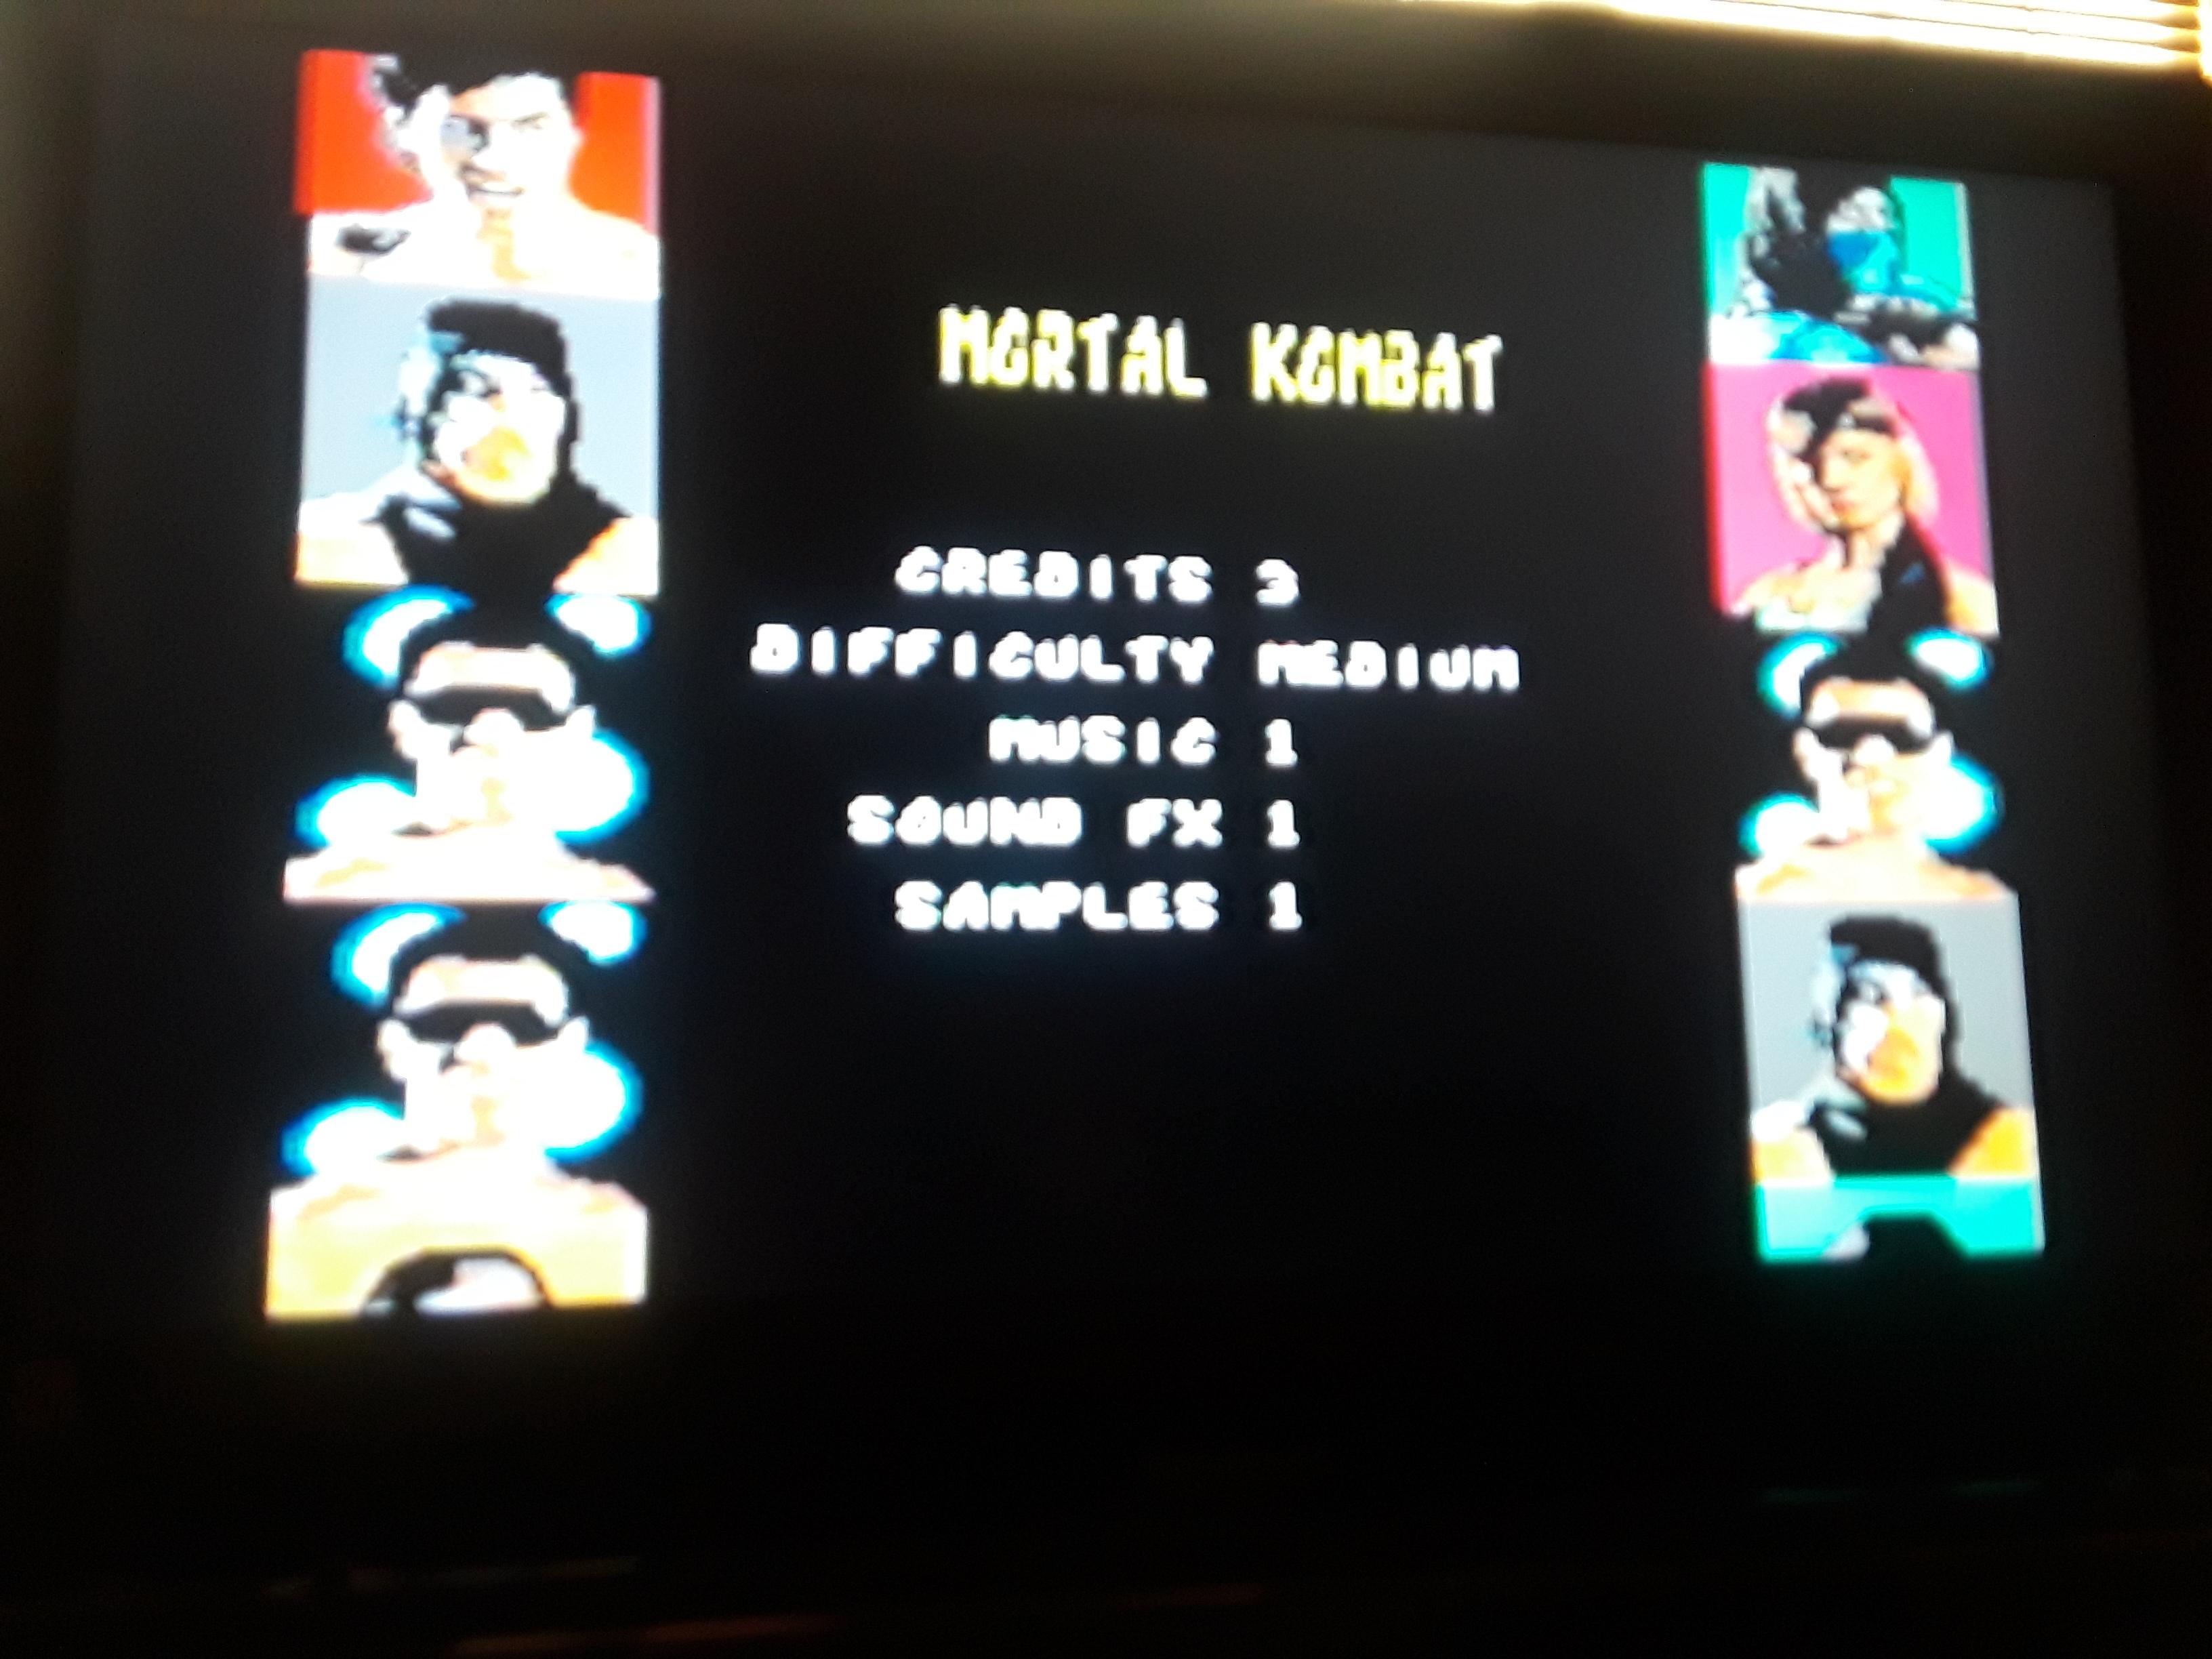 Mortal kombat [Medium]